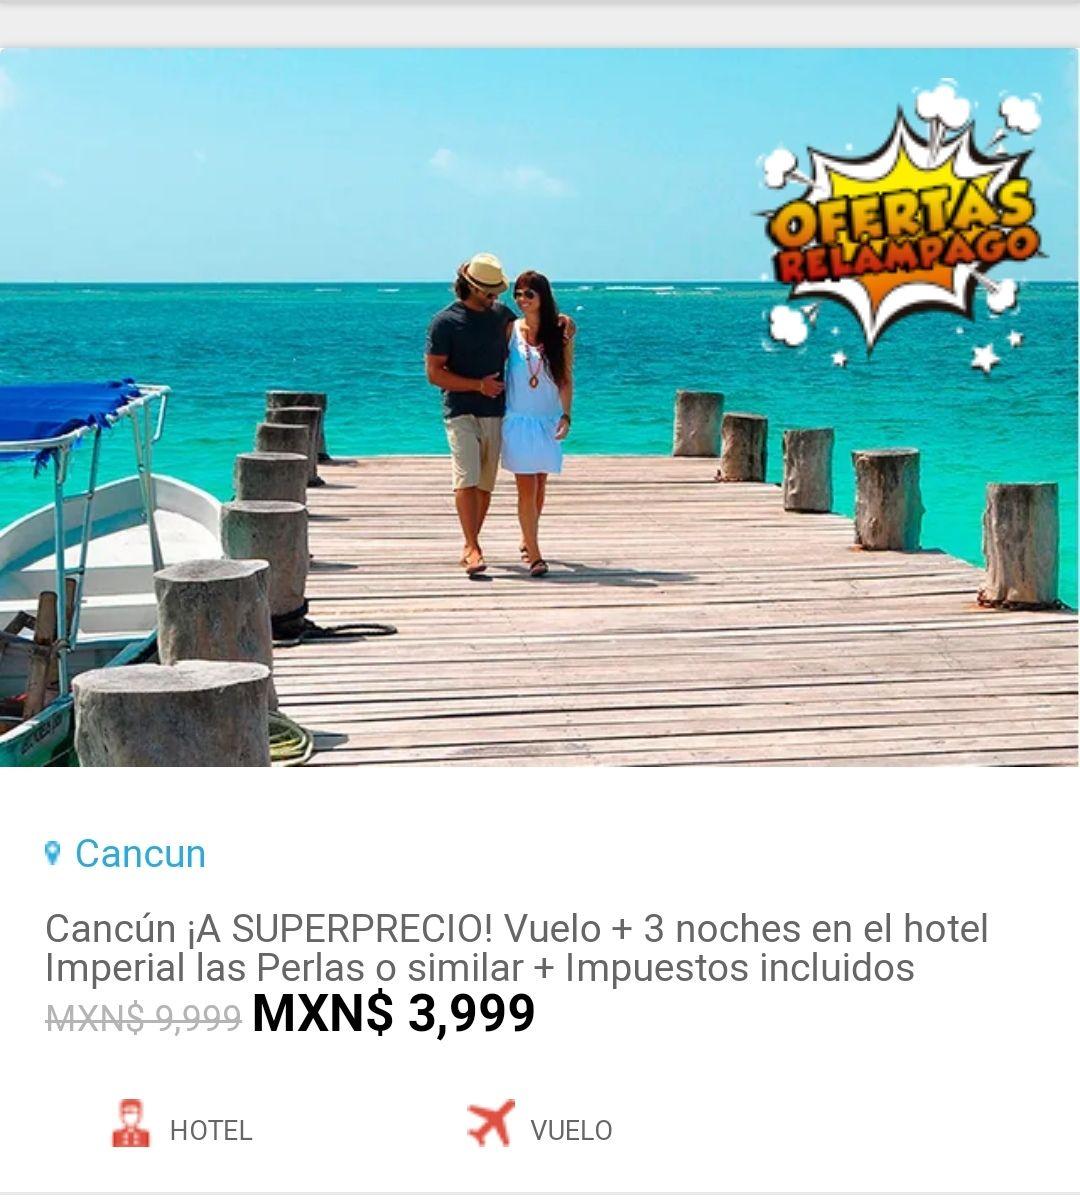 Ckickonero: Viaje a Cancun a un super precio con 60 %